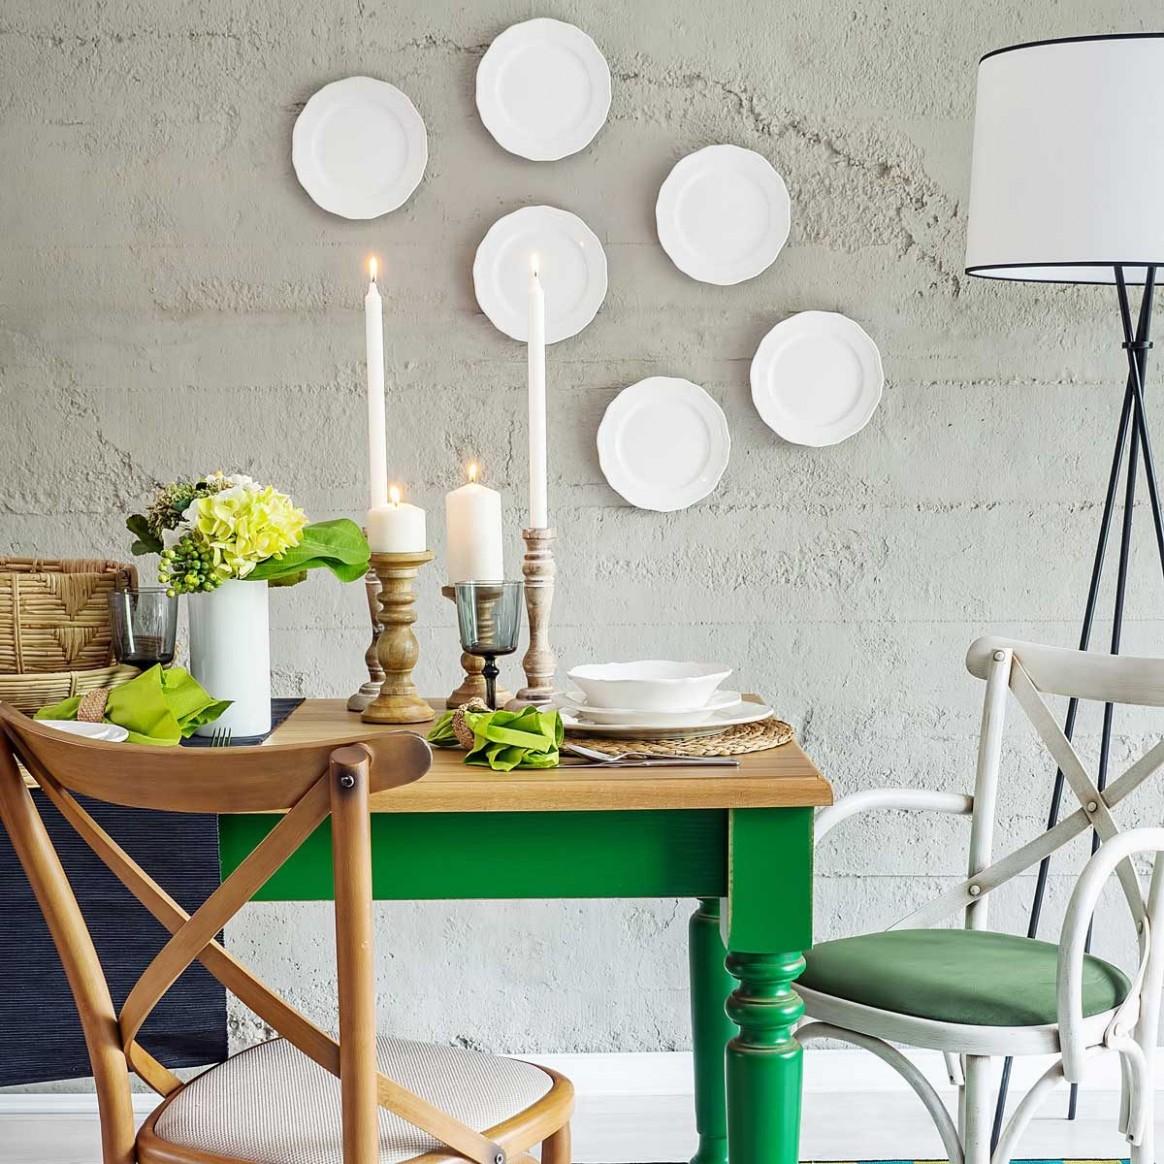 Fun Dining Room Wall Décor Ideas  Family Handyman - Dining Room Ideas For Walls